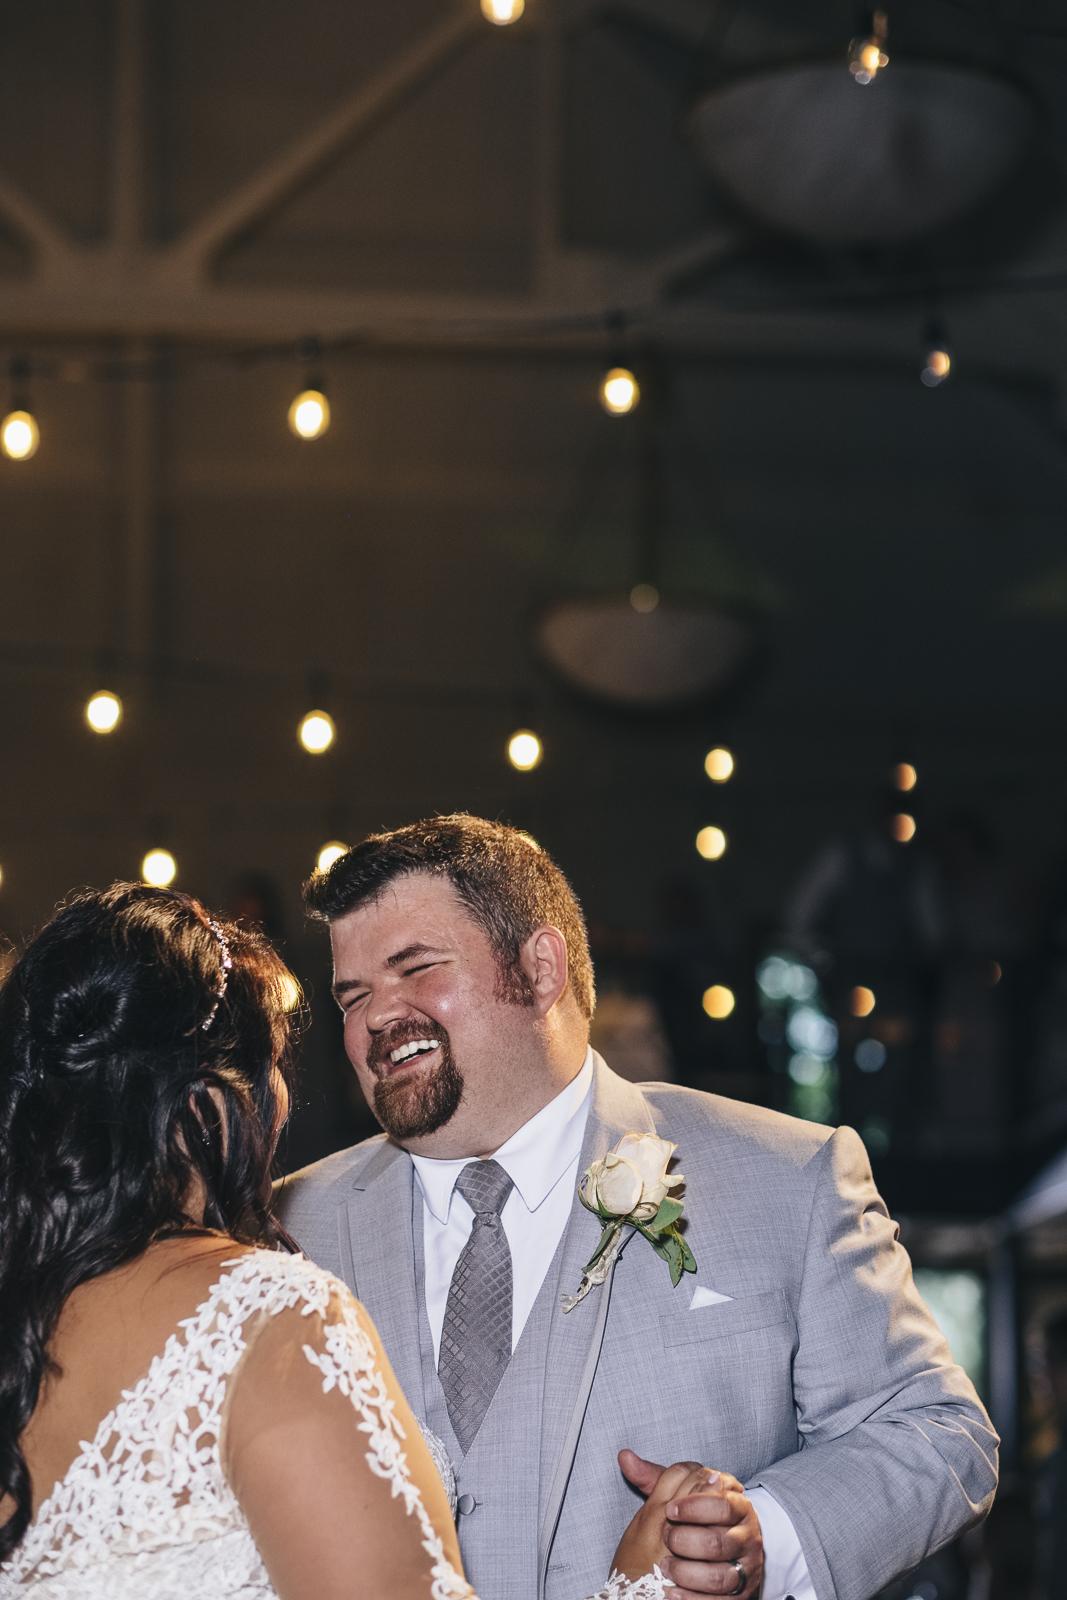 Groom during first dance at Nazareth Hall wedding reception.